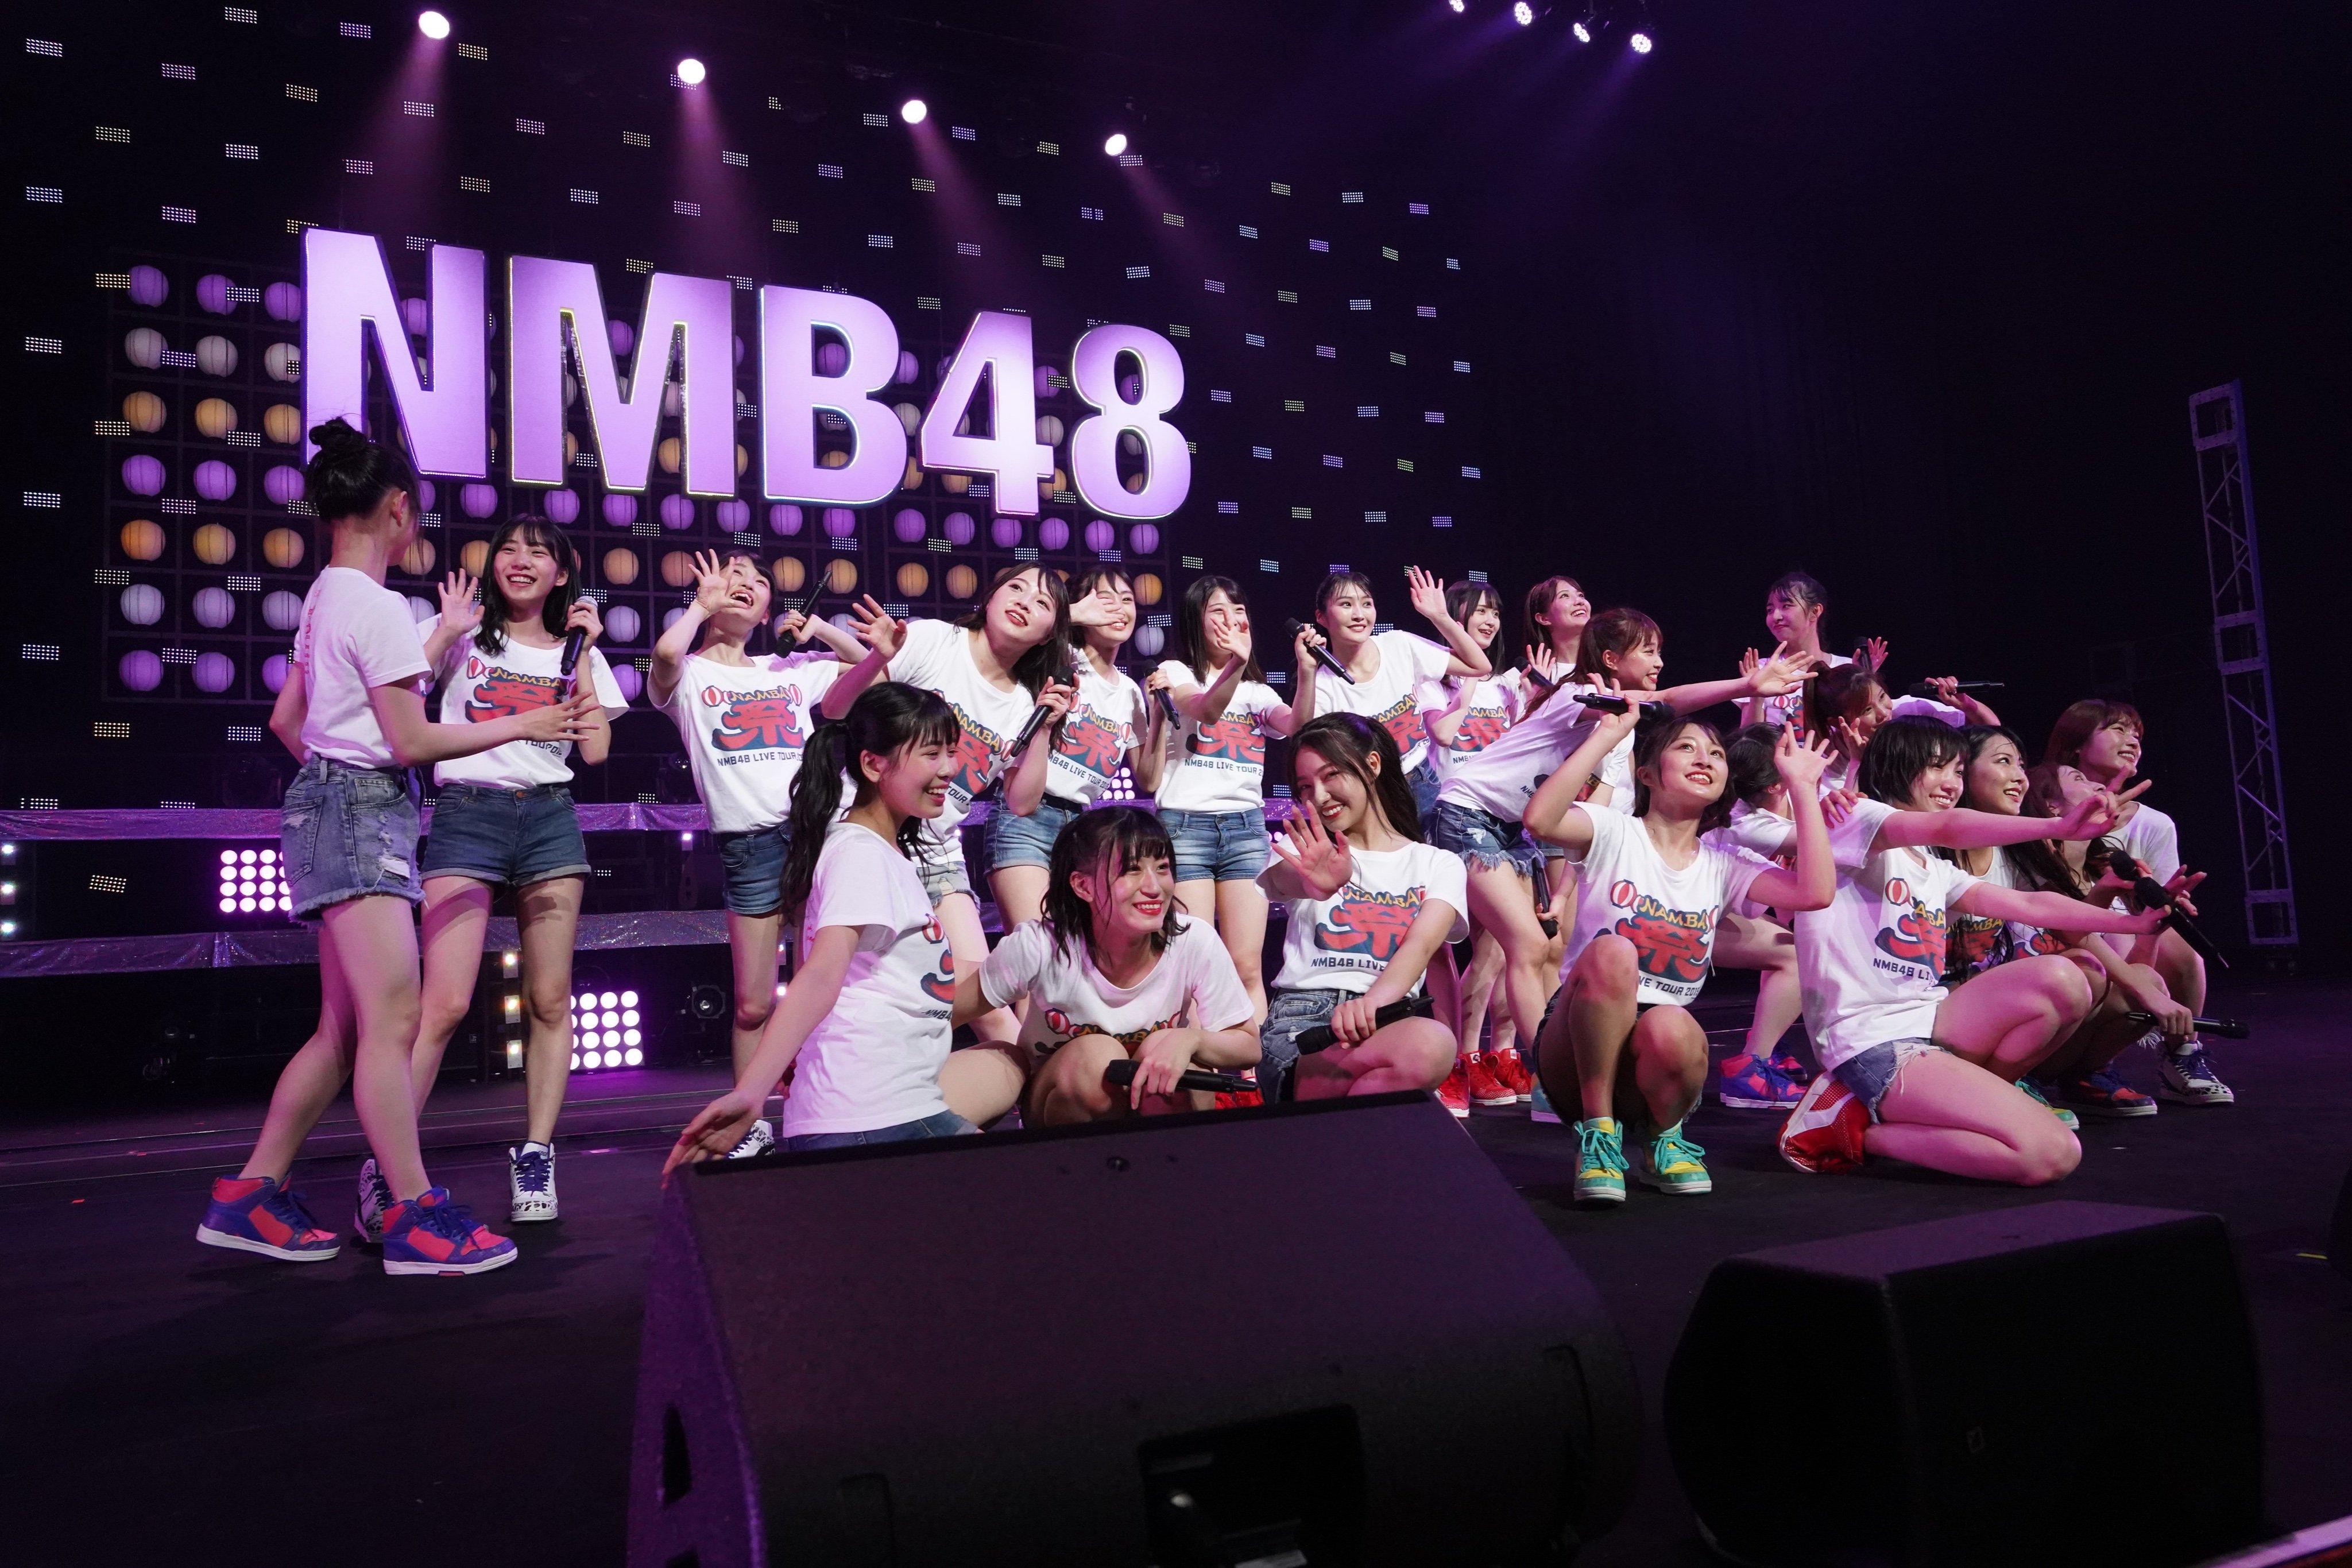 【NMB48】9月9日神戸国際会館「NMB48 LIVE TOUR 2019 ~NAMBA祭~」セットリストと画像・「わるぴぃ」動画など